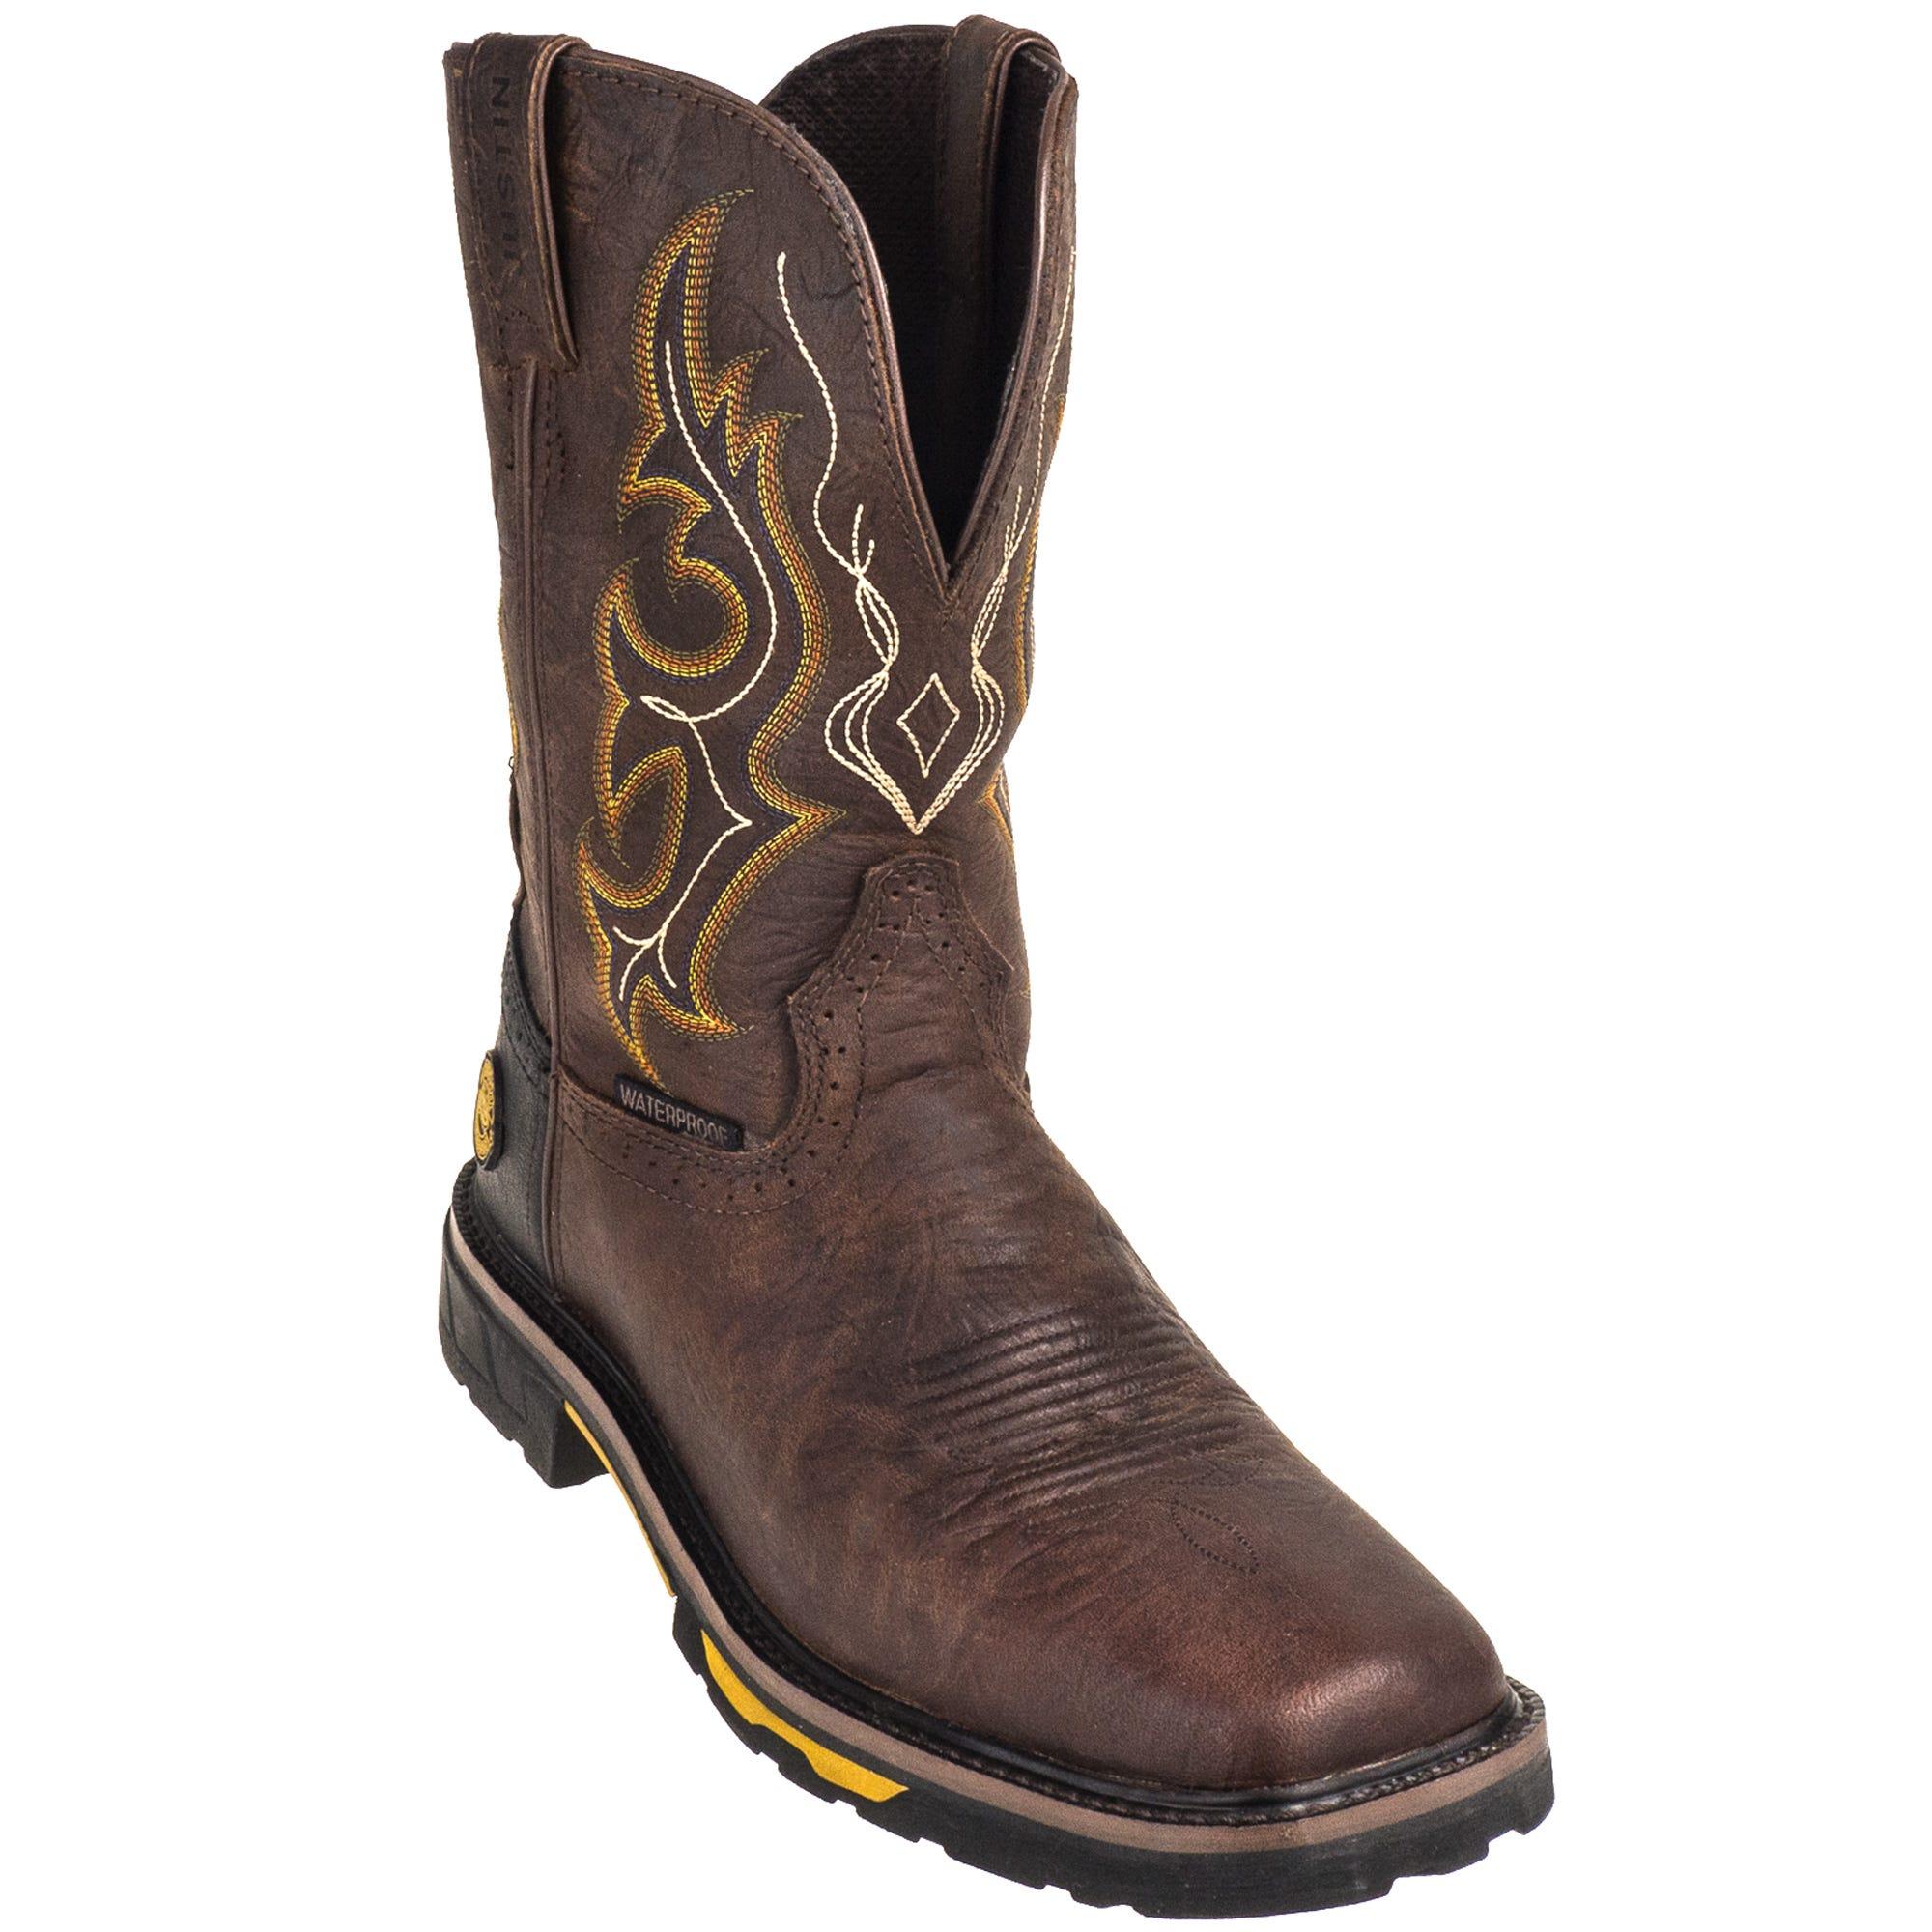 00d3c06e3 Justin Men's Boots | MenStyle USA